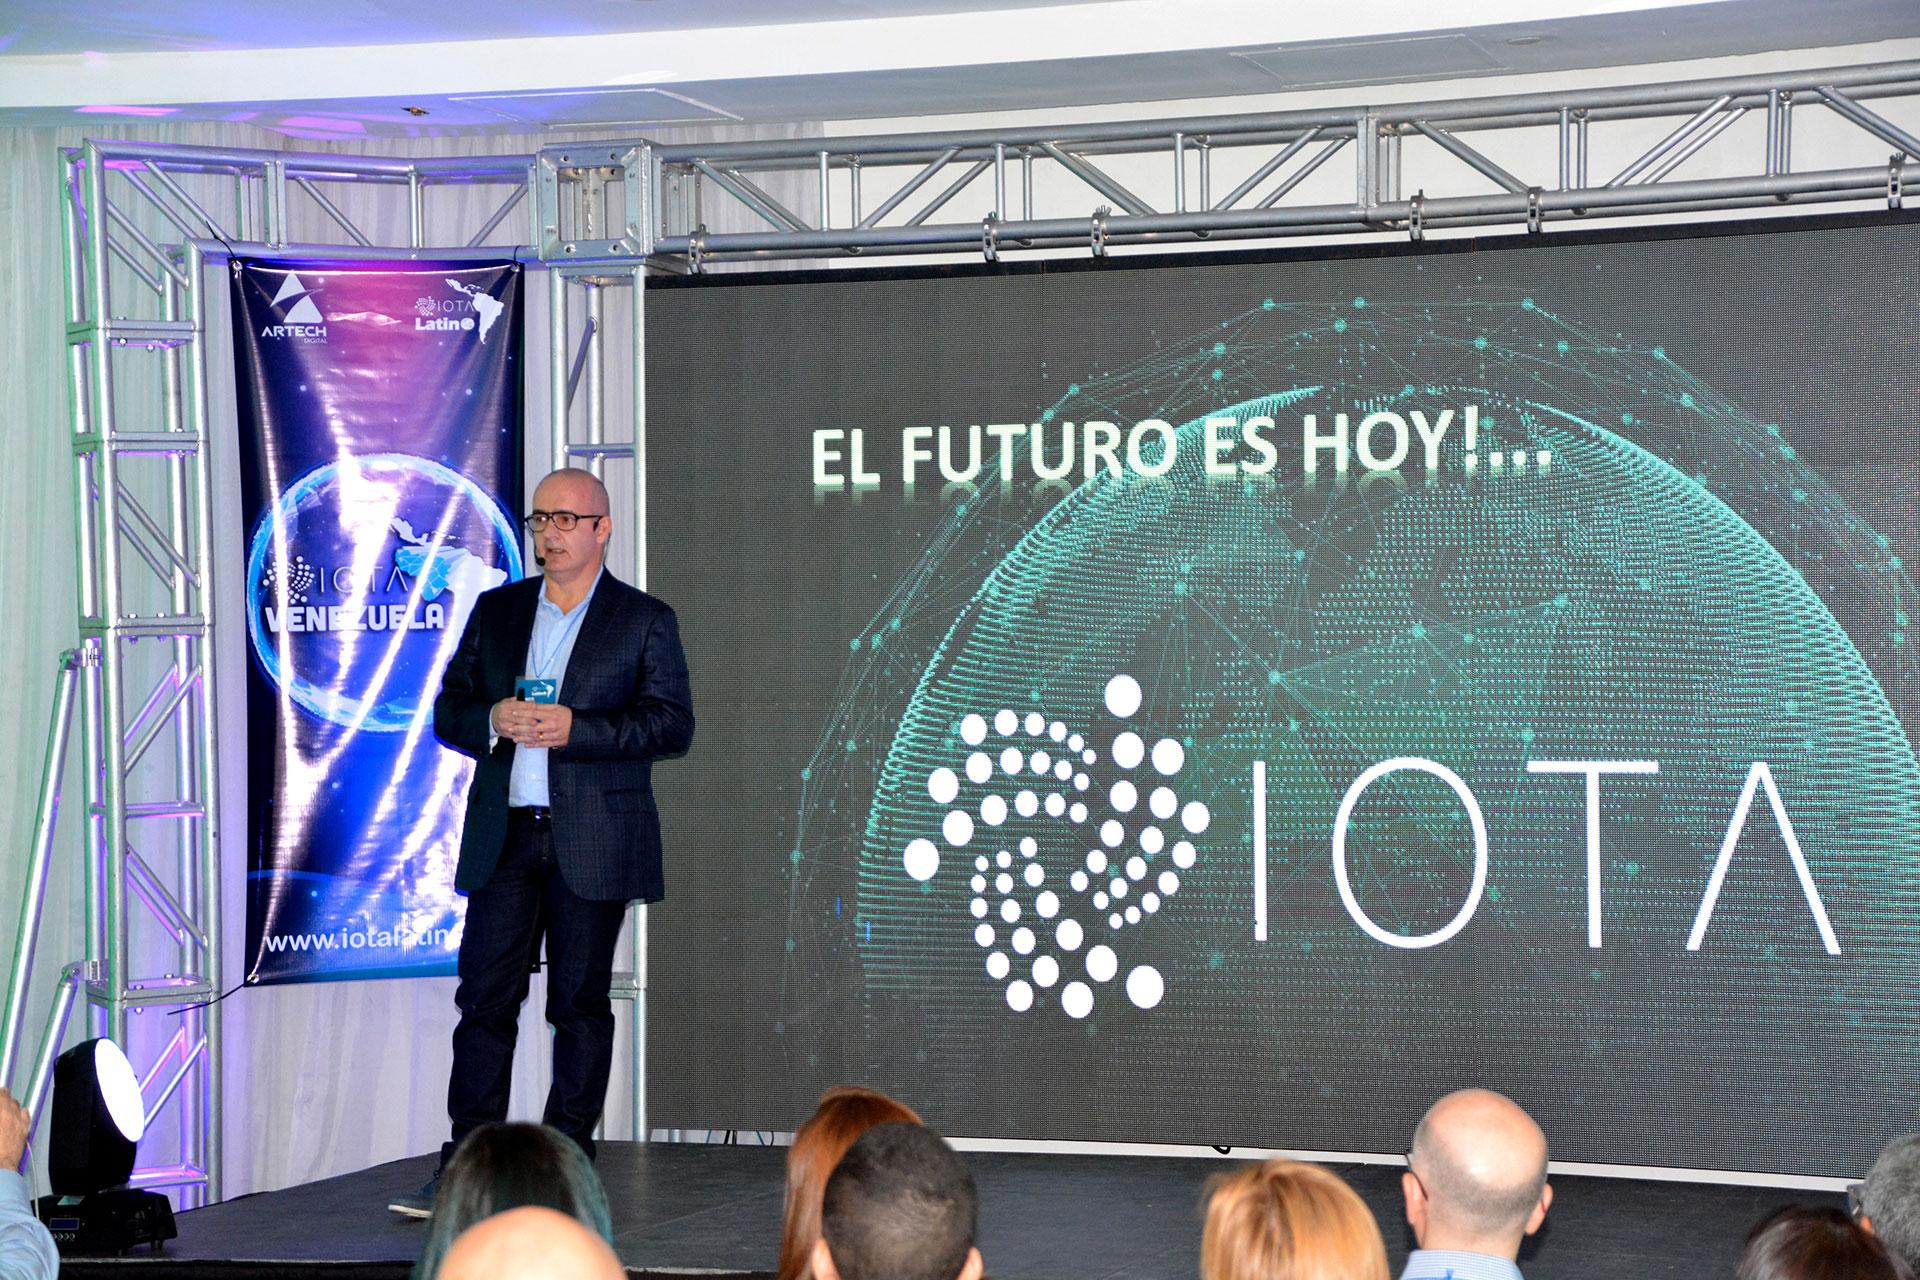 primer meetup de IOTA en Venezuela - Saul Ameliach - 8